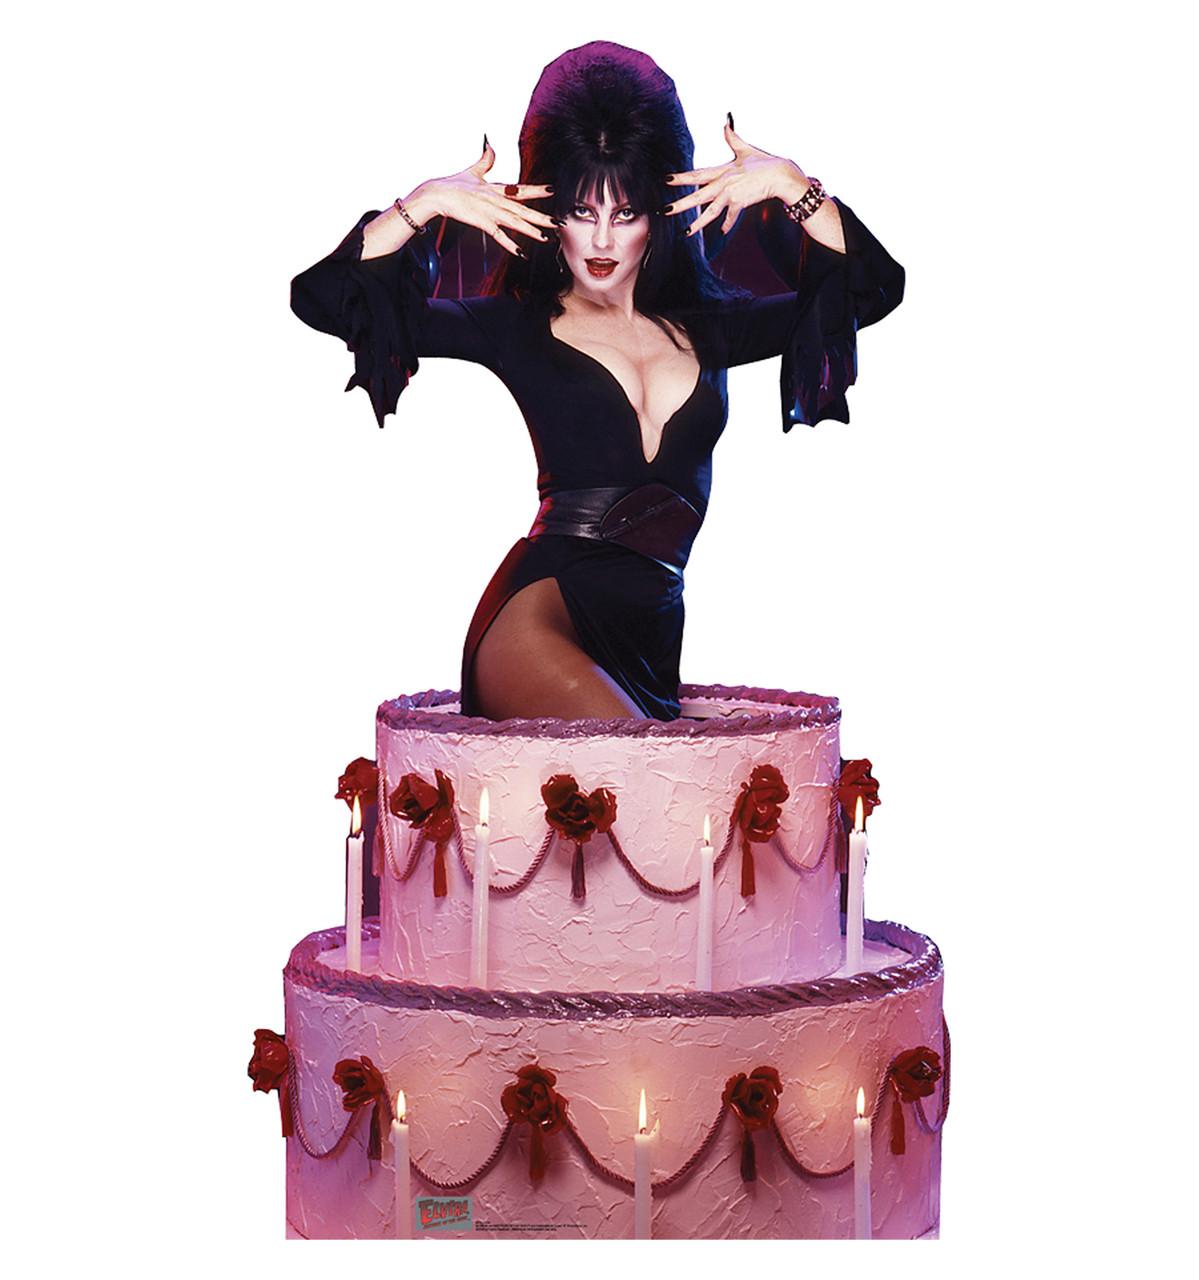 Life-size Elvira - Cake Cardboard Standup   Cardboard Cutout